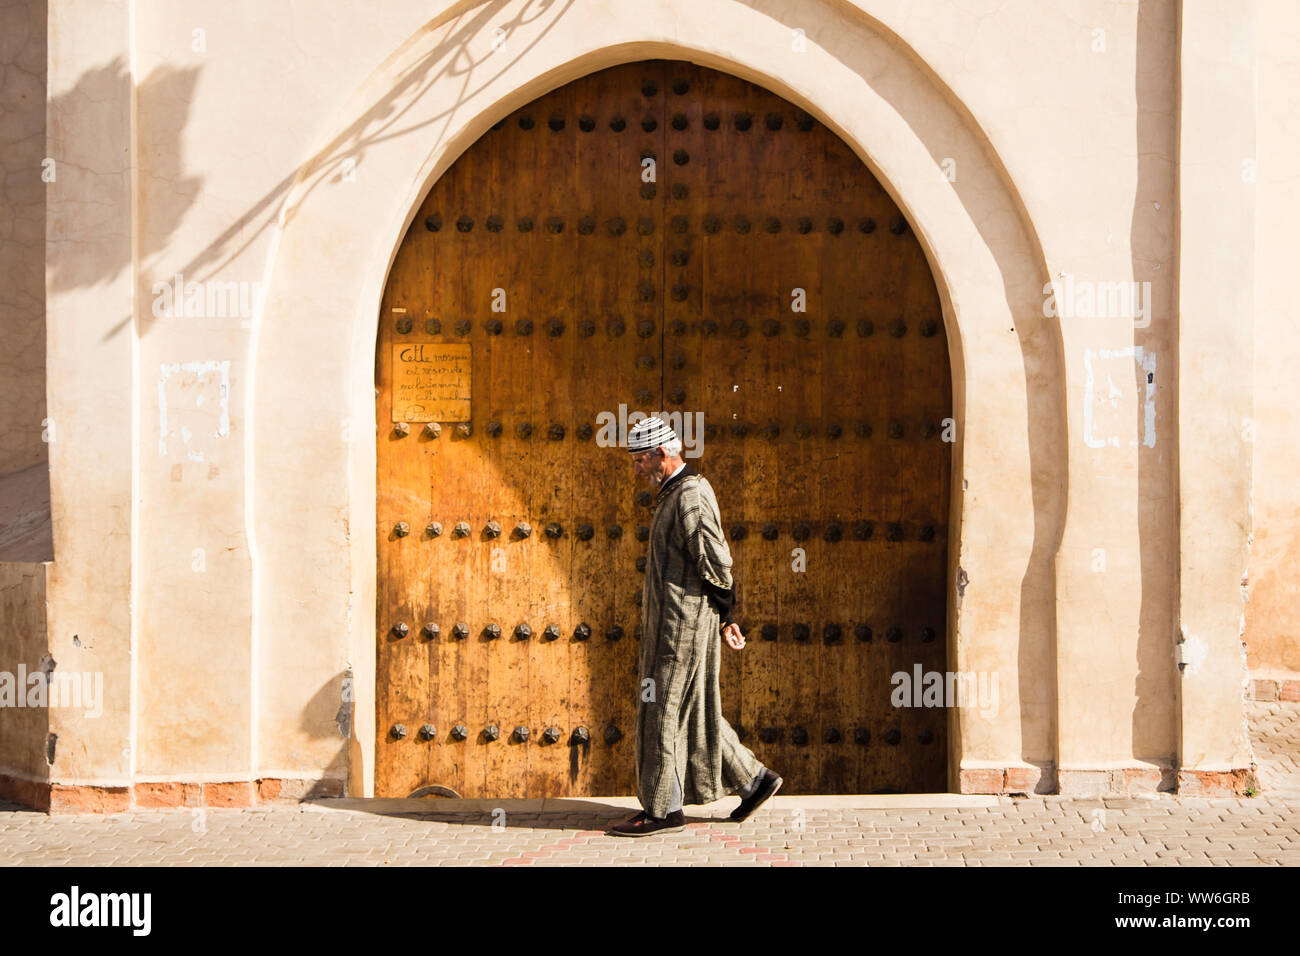 Street scene in Marrakech, Morocco Stock Photo